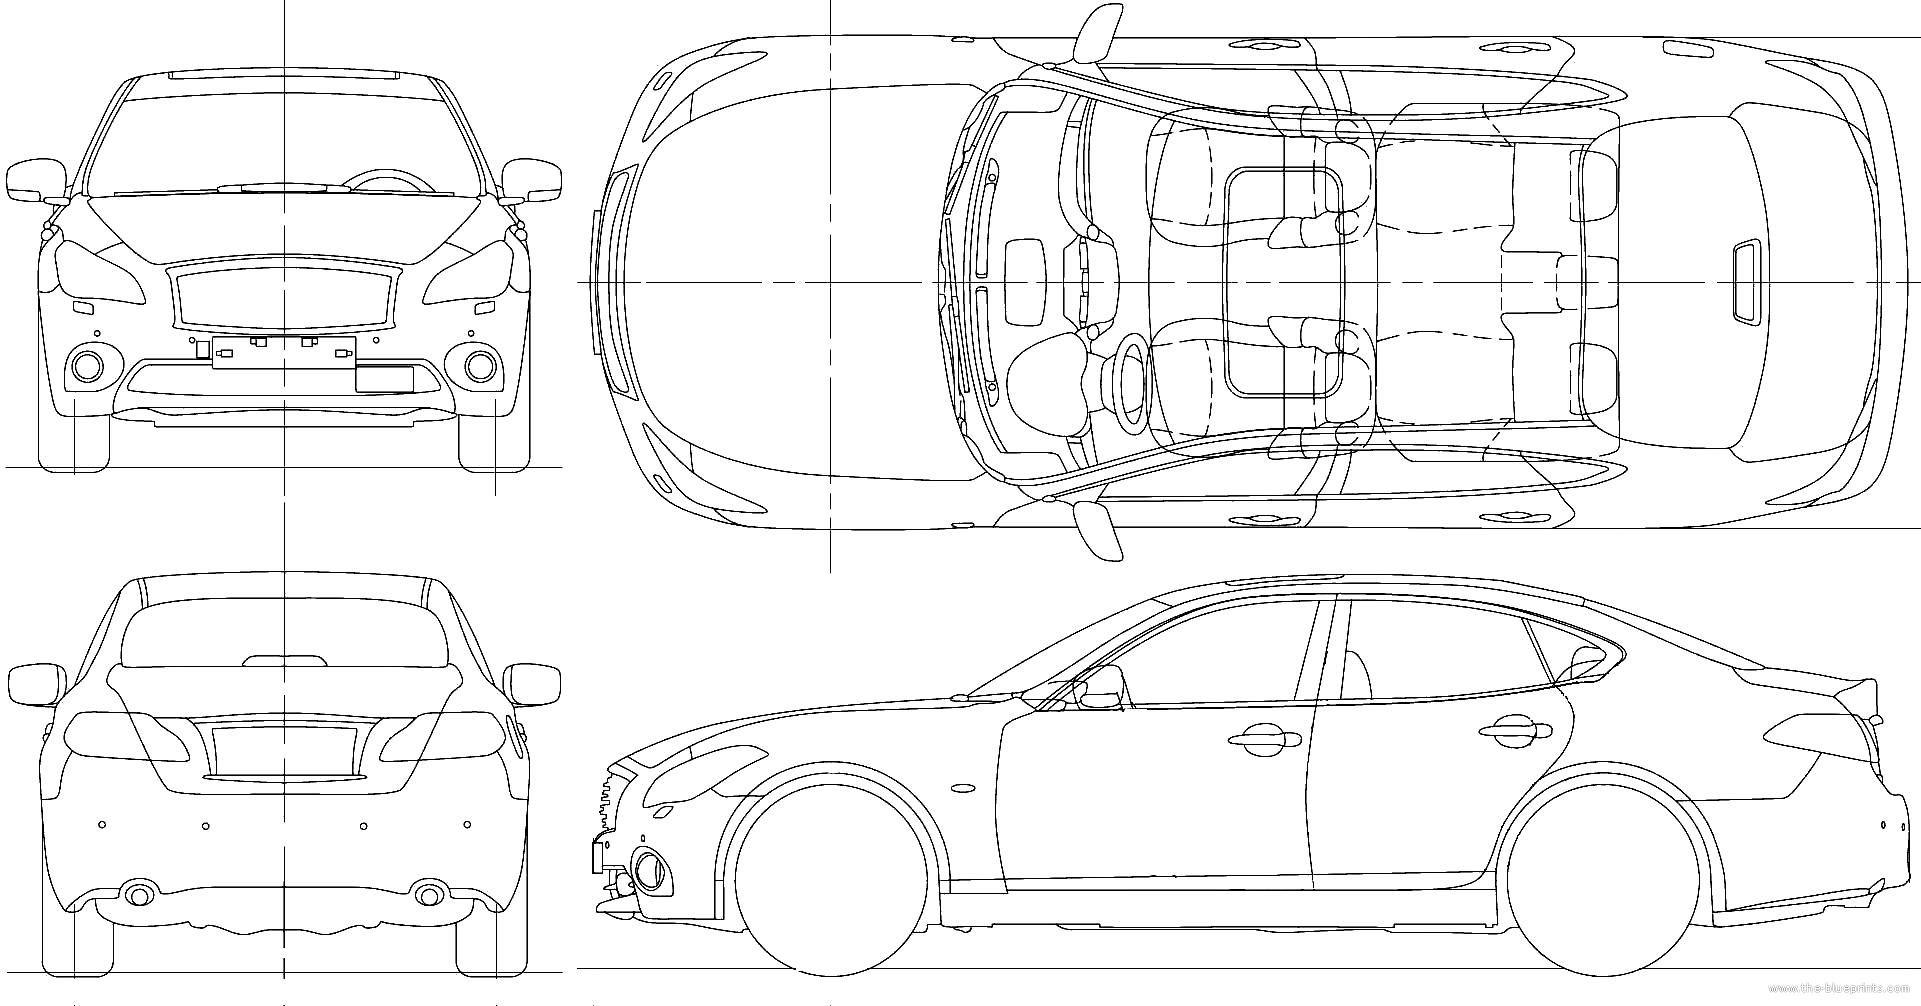 2010 infiniti m45 sedan blueprints free